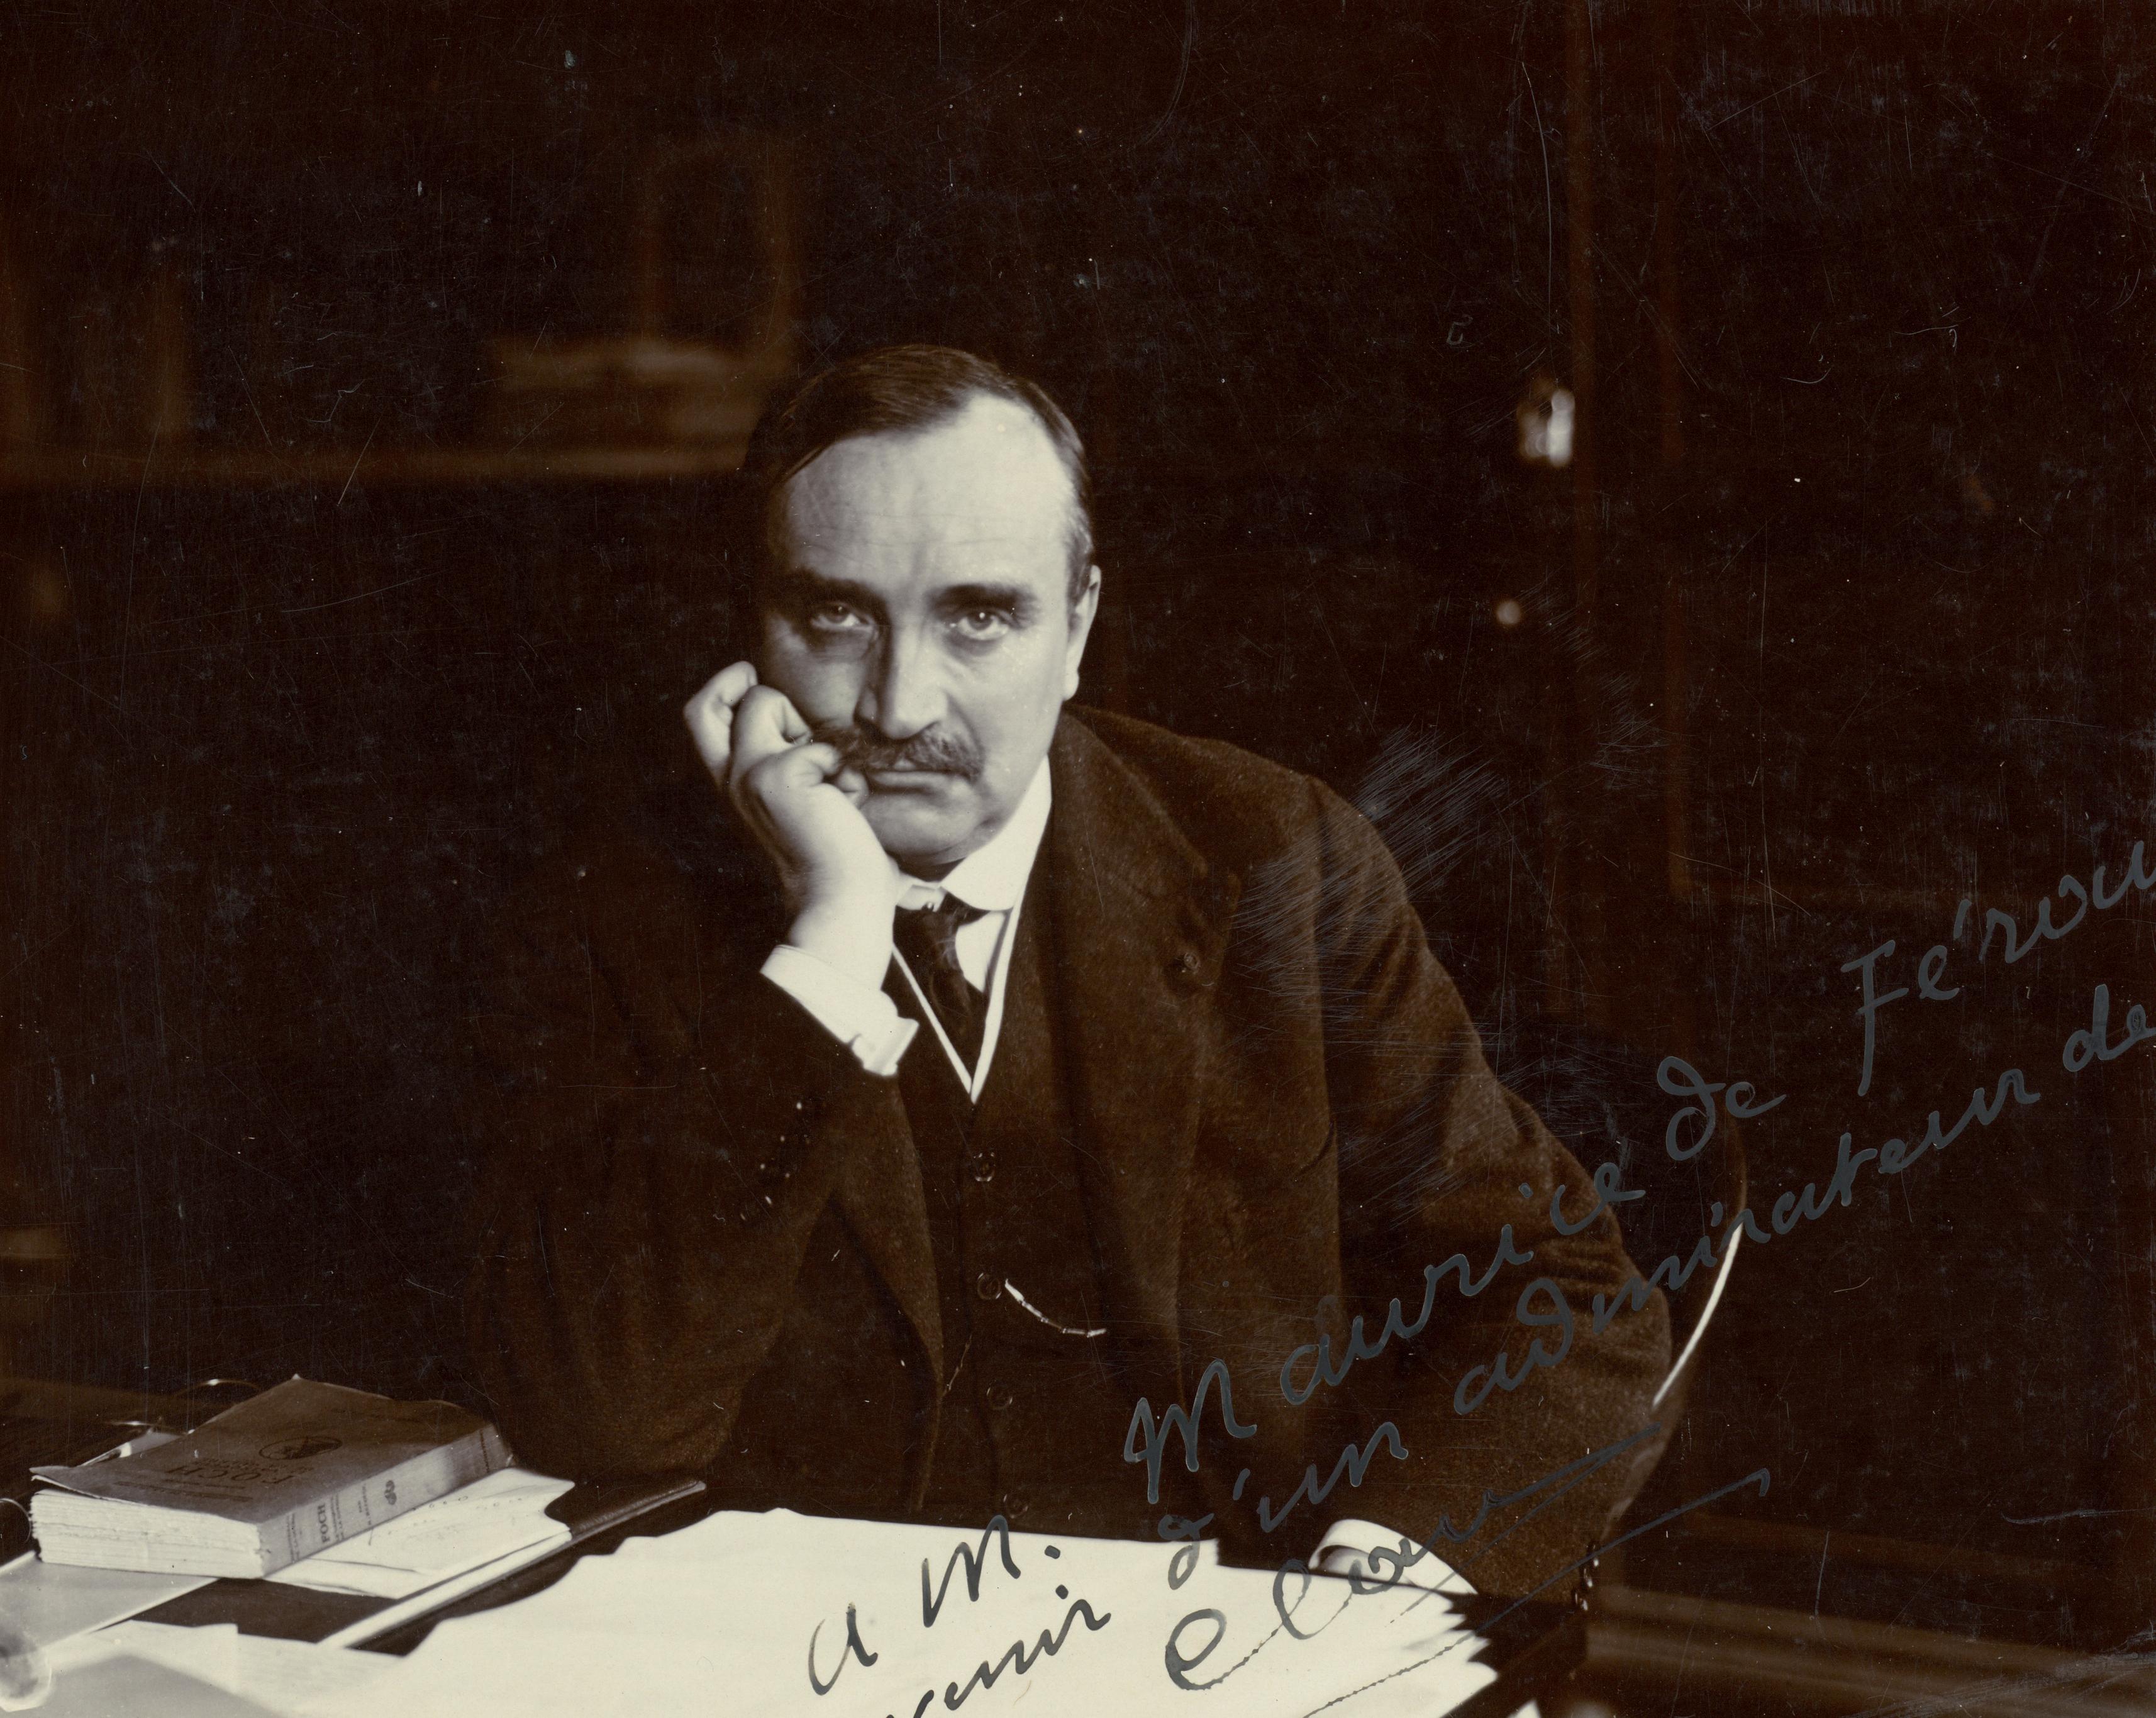 claudel-paul-dedicace-a-m.-de-feraudy-vers-1920-2-